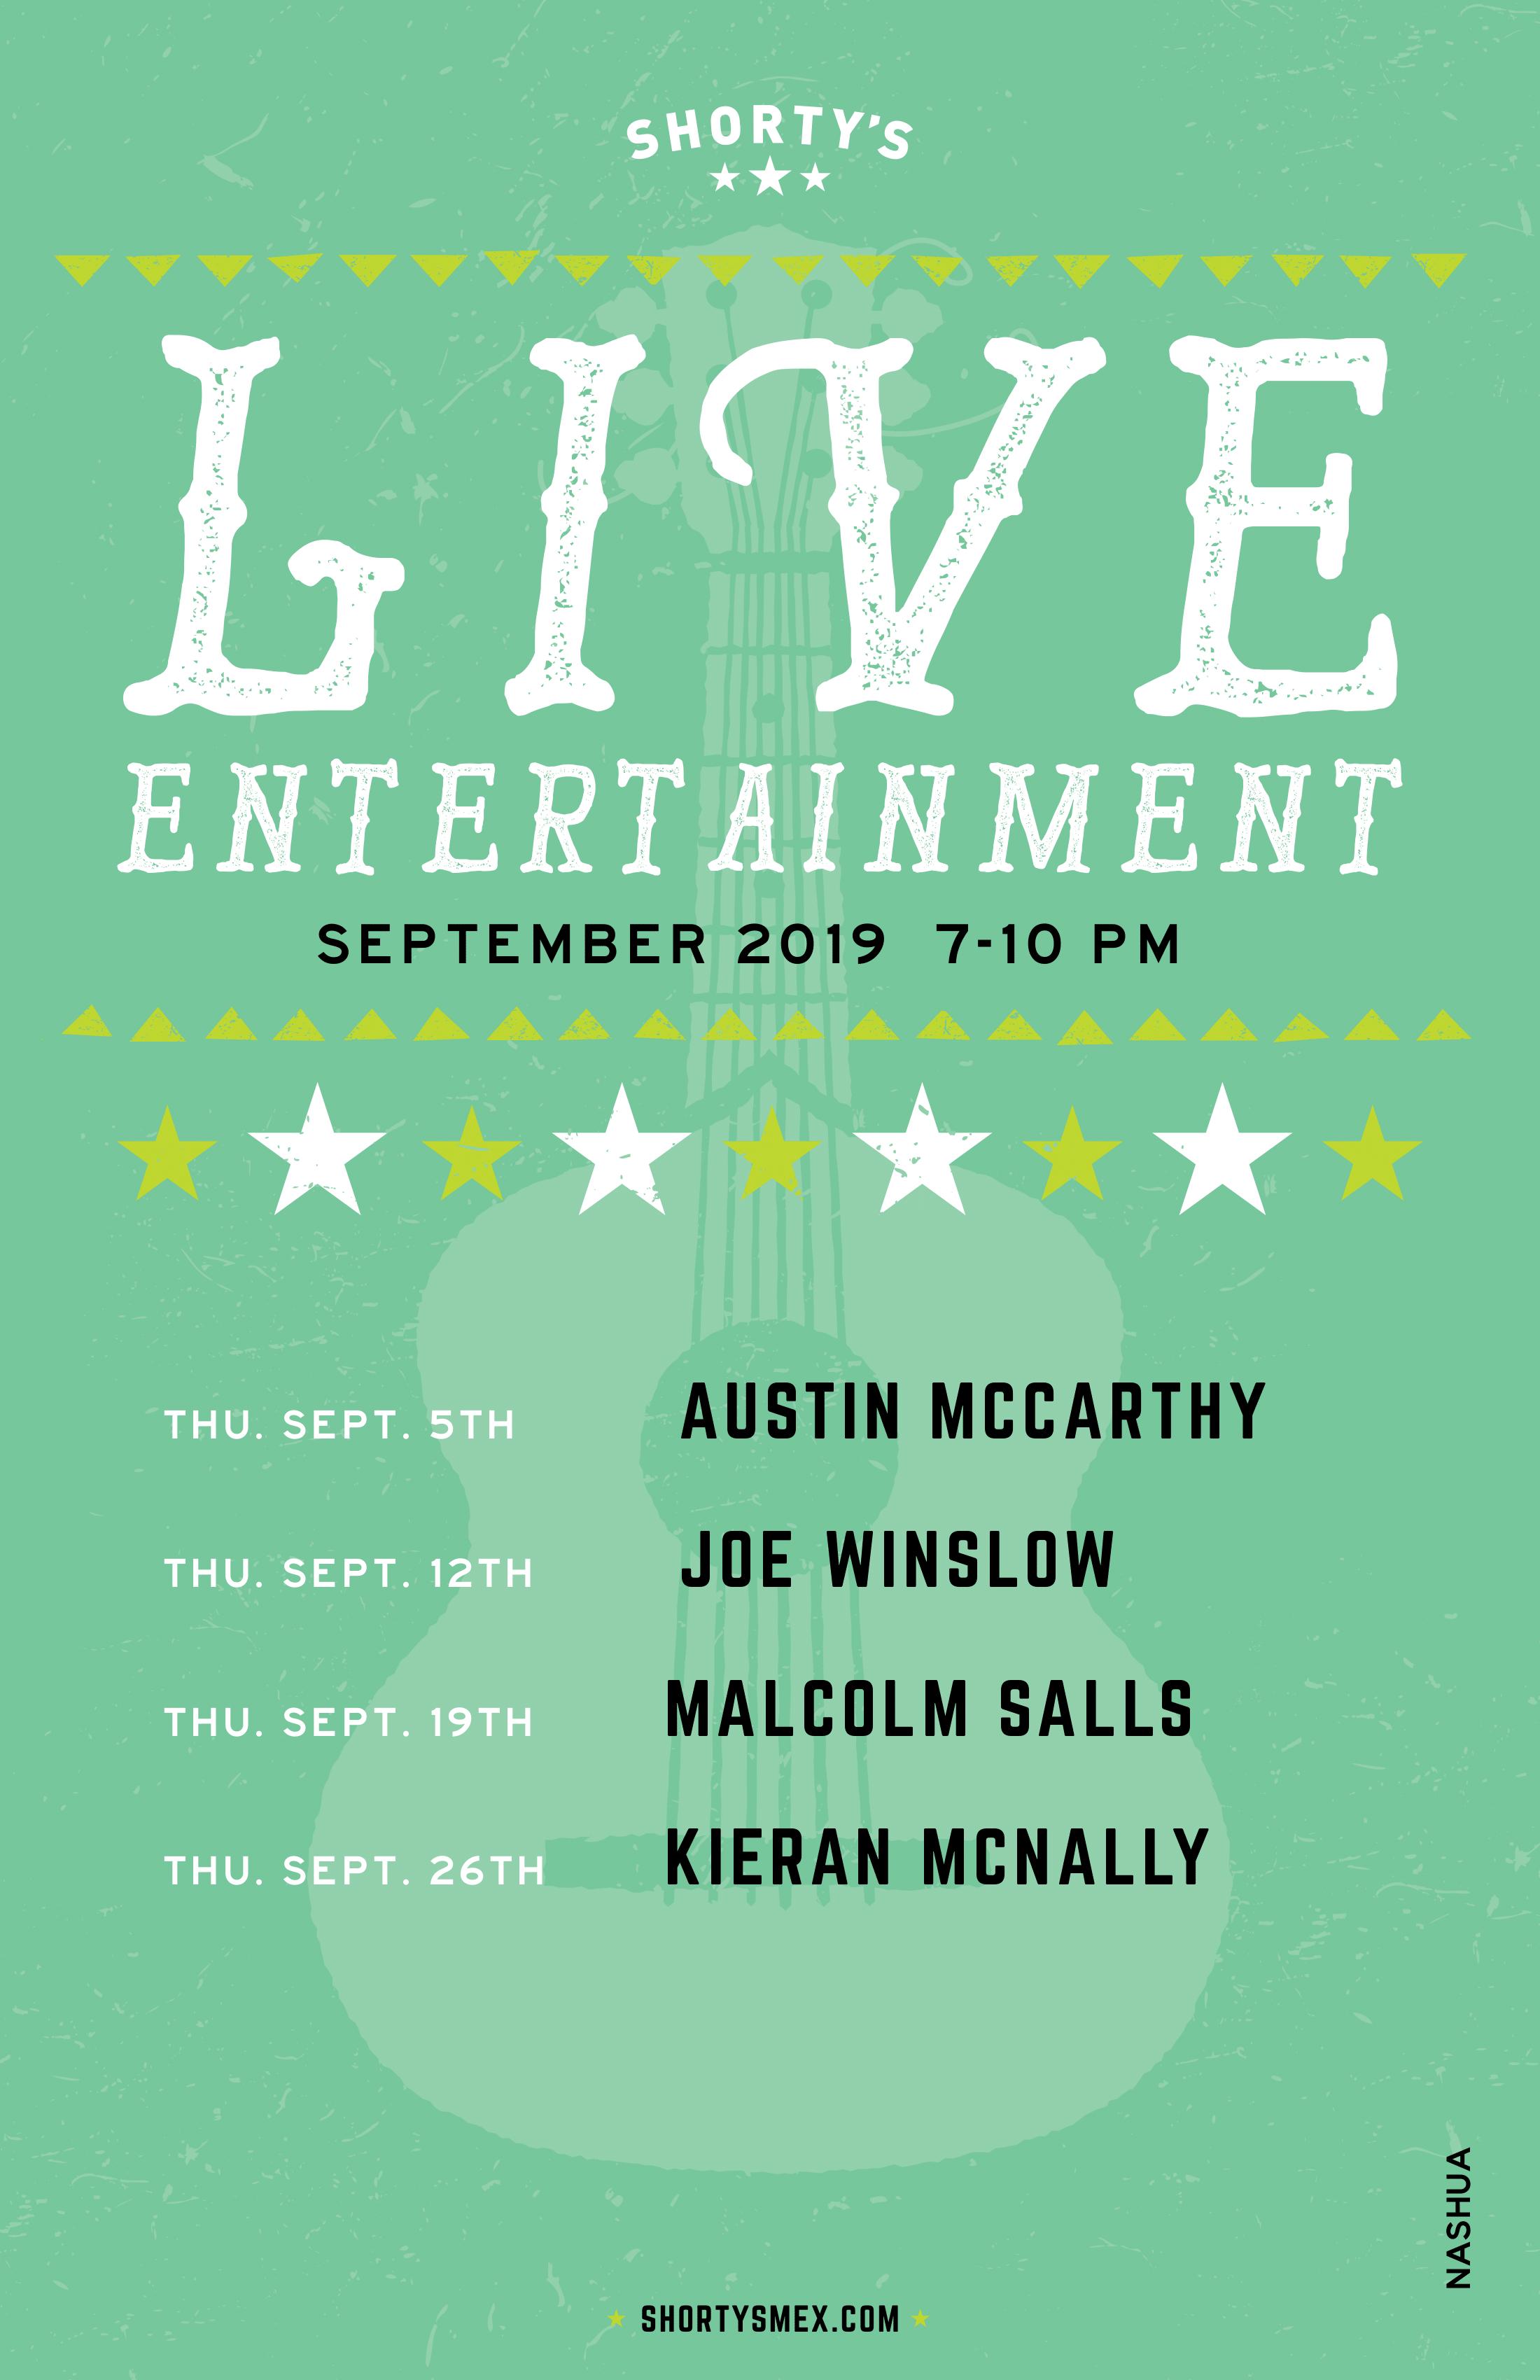 September Entertainment Schedule for Shorty's Nashua